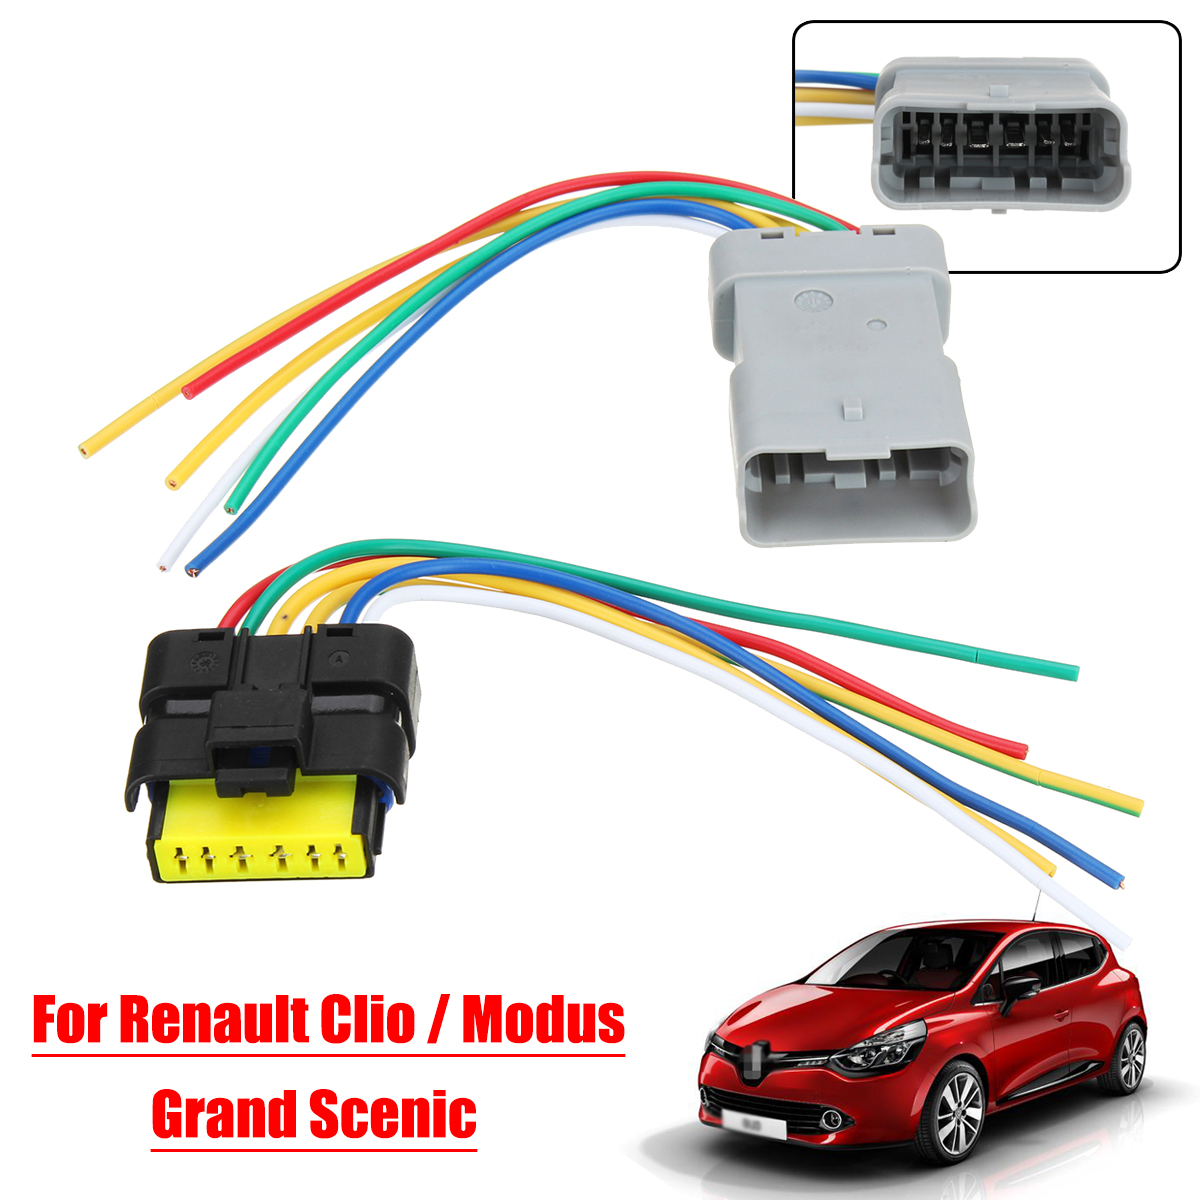 1set window module wiring ponytail harness plastic plug for renault clio grand scenic modus [ 1200 x 1200 Pixel ]